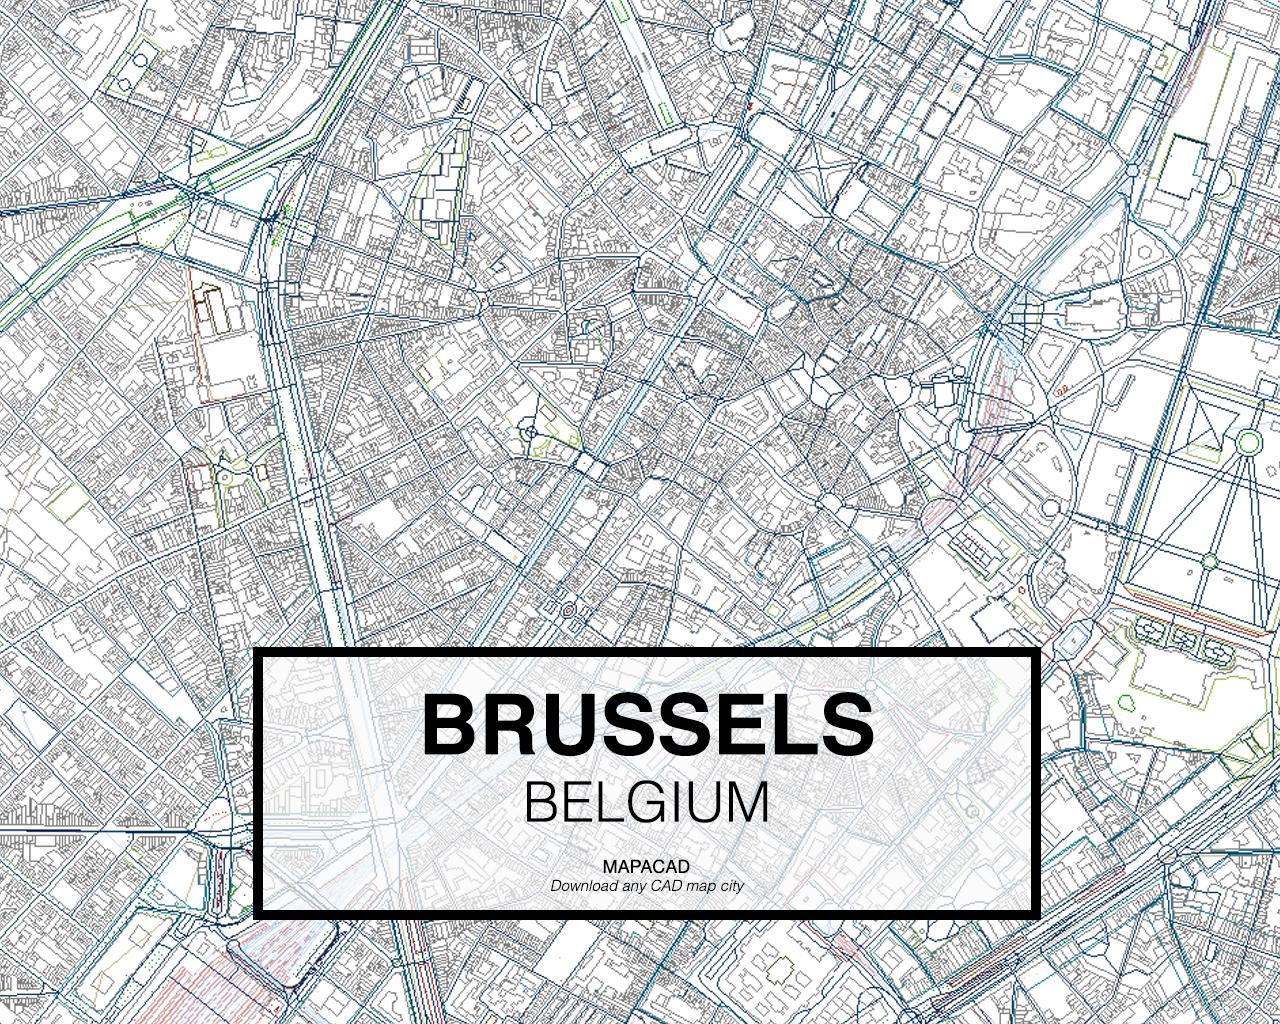 brussels belgium 02 mapacad download map cad dwg